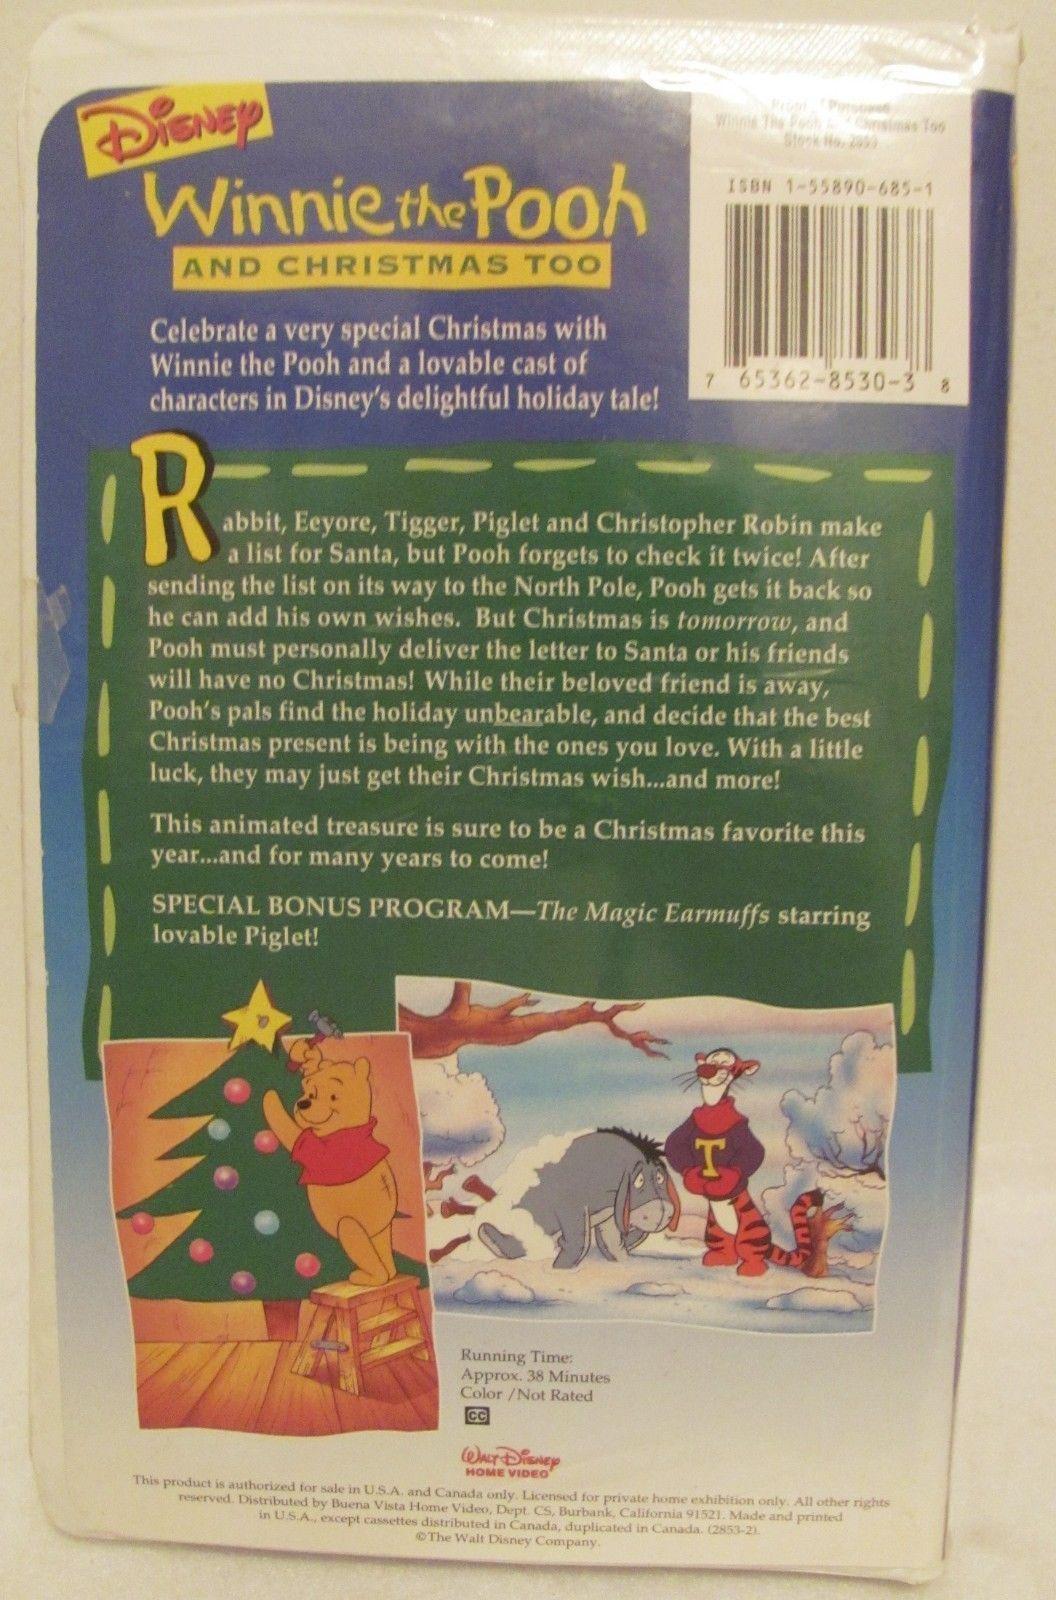 Winnie The Pooh And Christmas Too.Vhs Winnie The Pooh And Christmas Too Vhs And 16 Similar Items